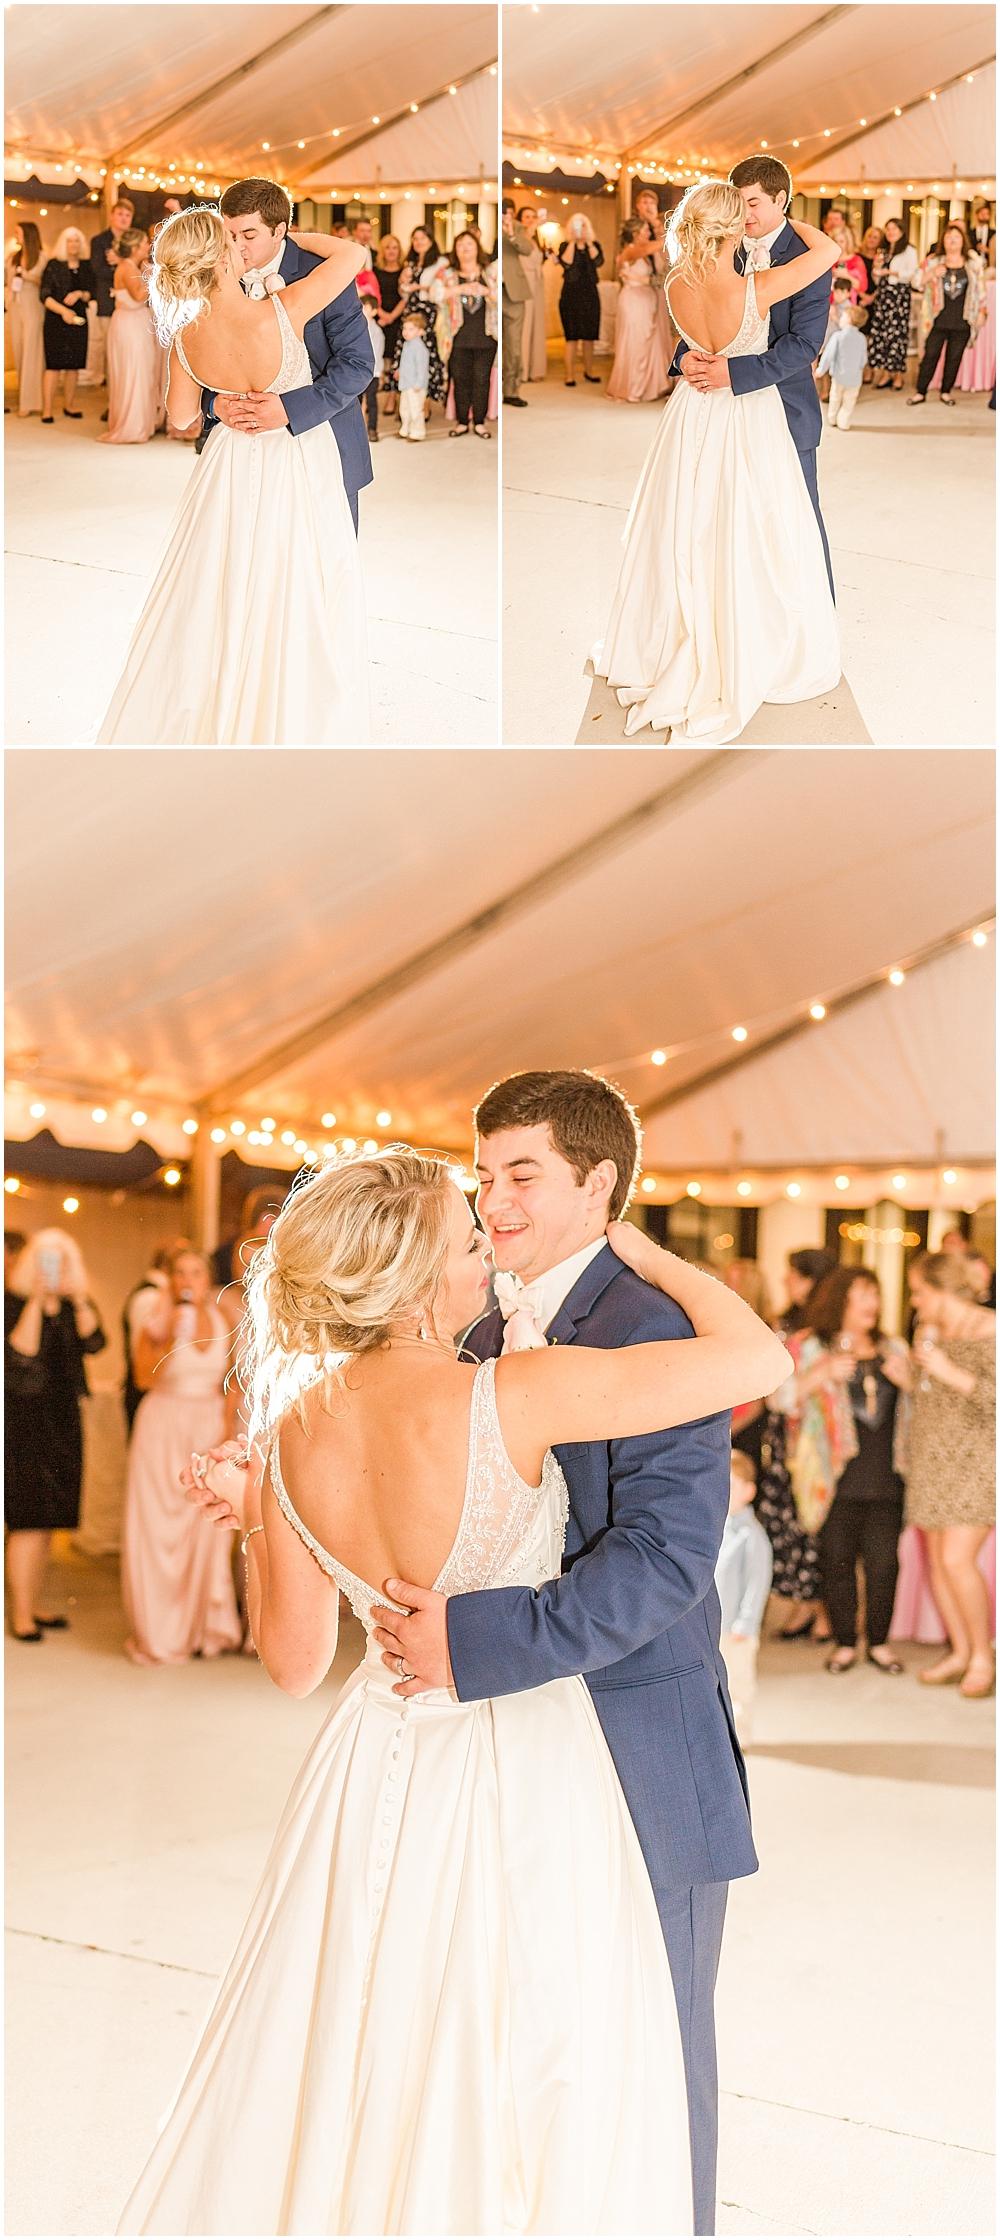 Ashton-Clark-Photography-Wedding-Portrait-Family-Photographer-Mobile-Alabama_0361.jpg